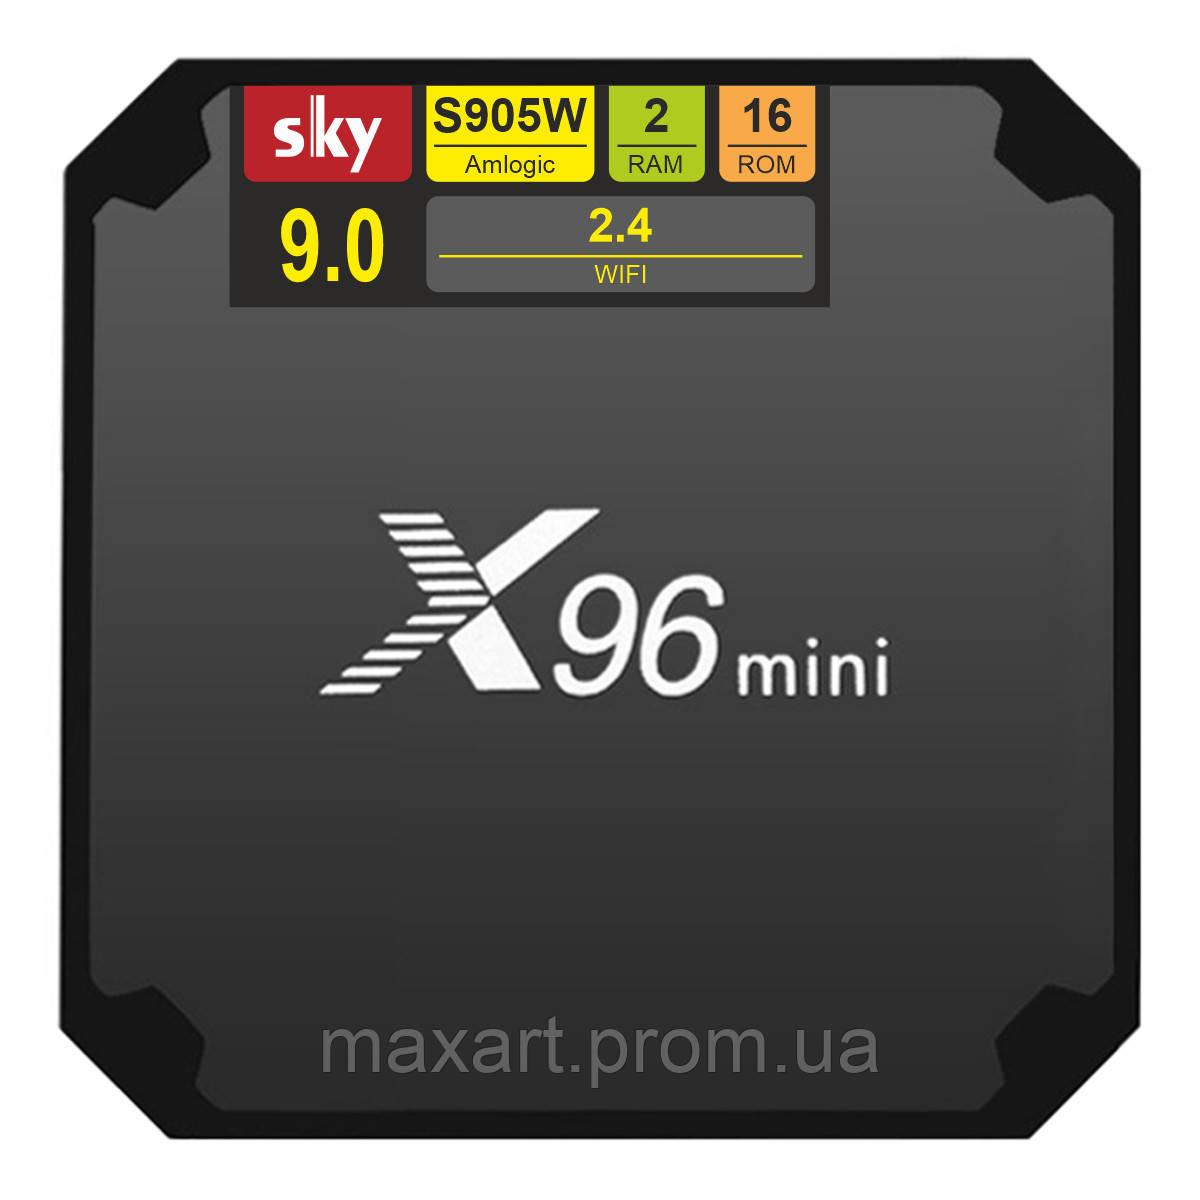 Android TV приставка SKY (X96 mini) 9.0 2/16 GB